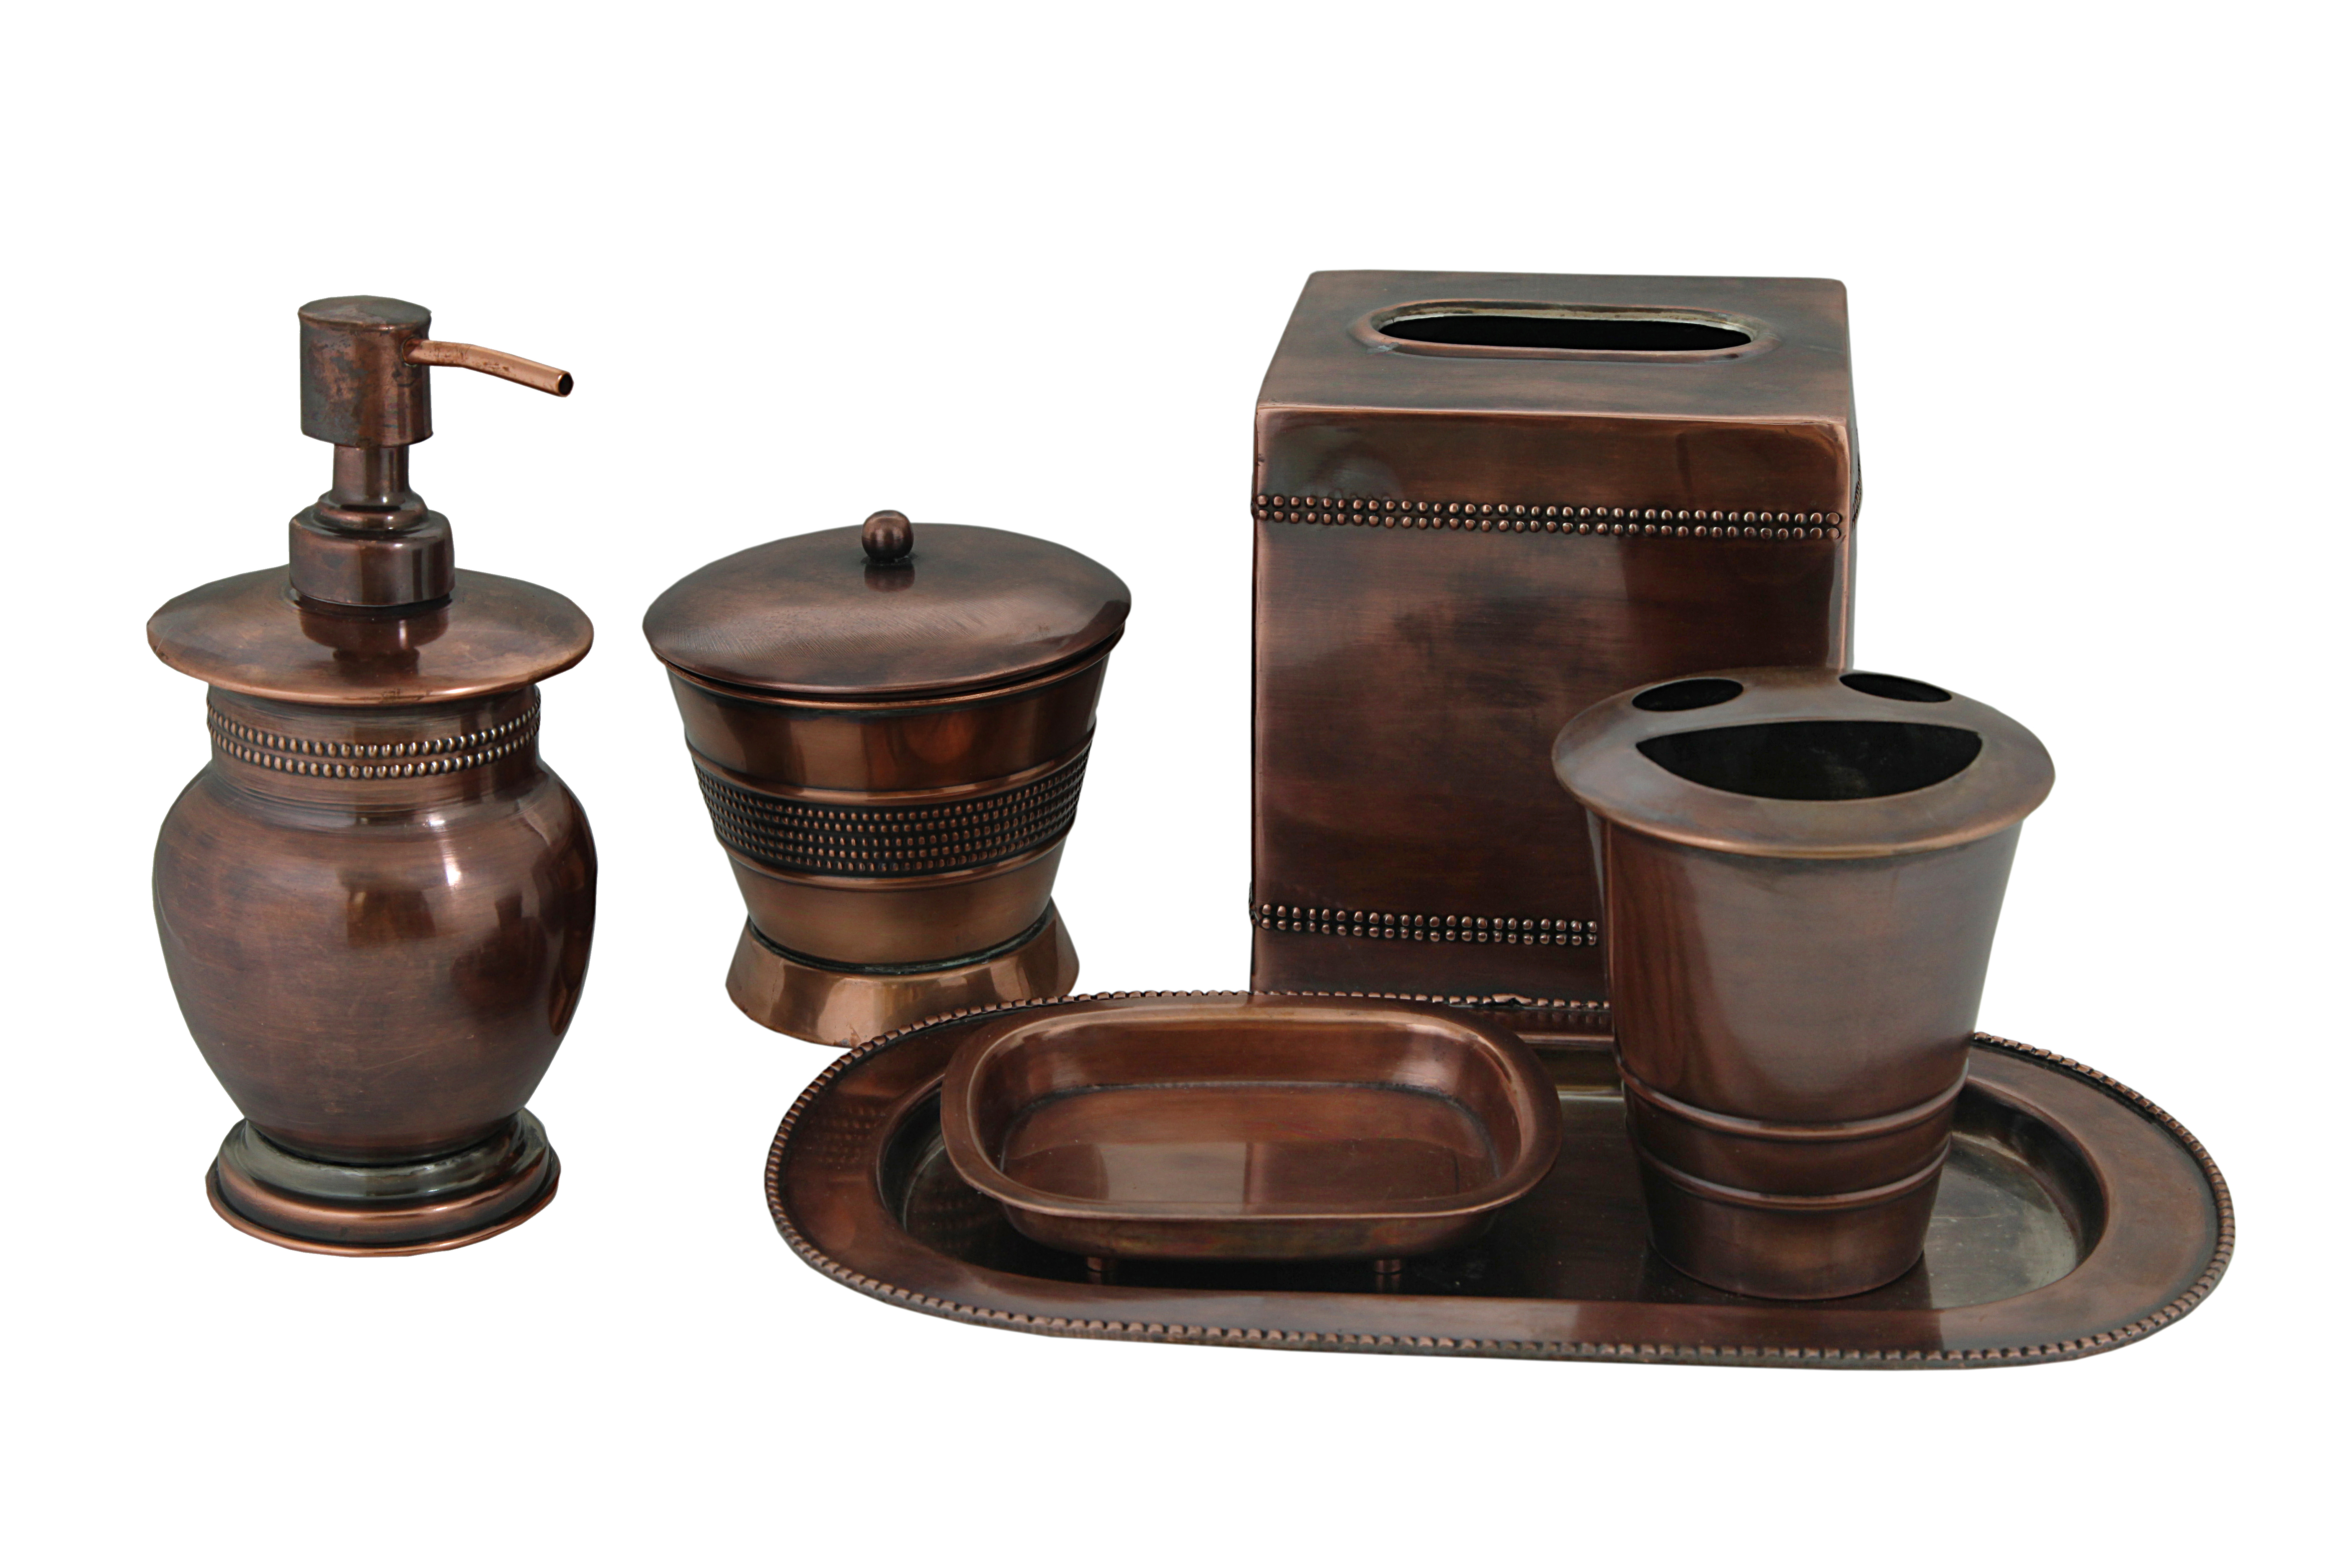 S.S. Bathroom Accessories Set